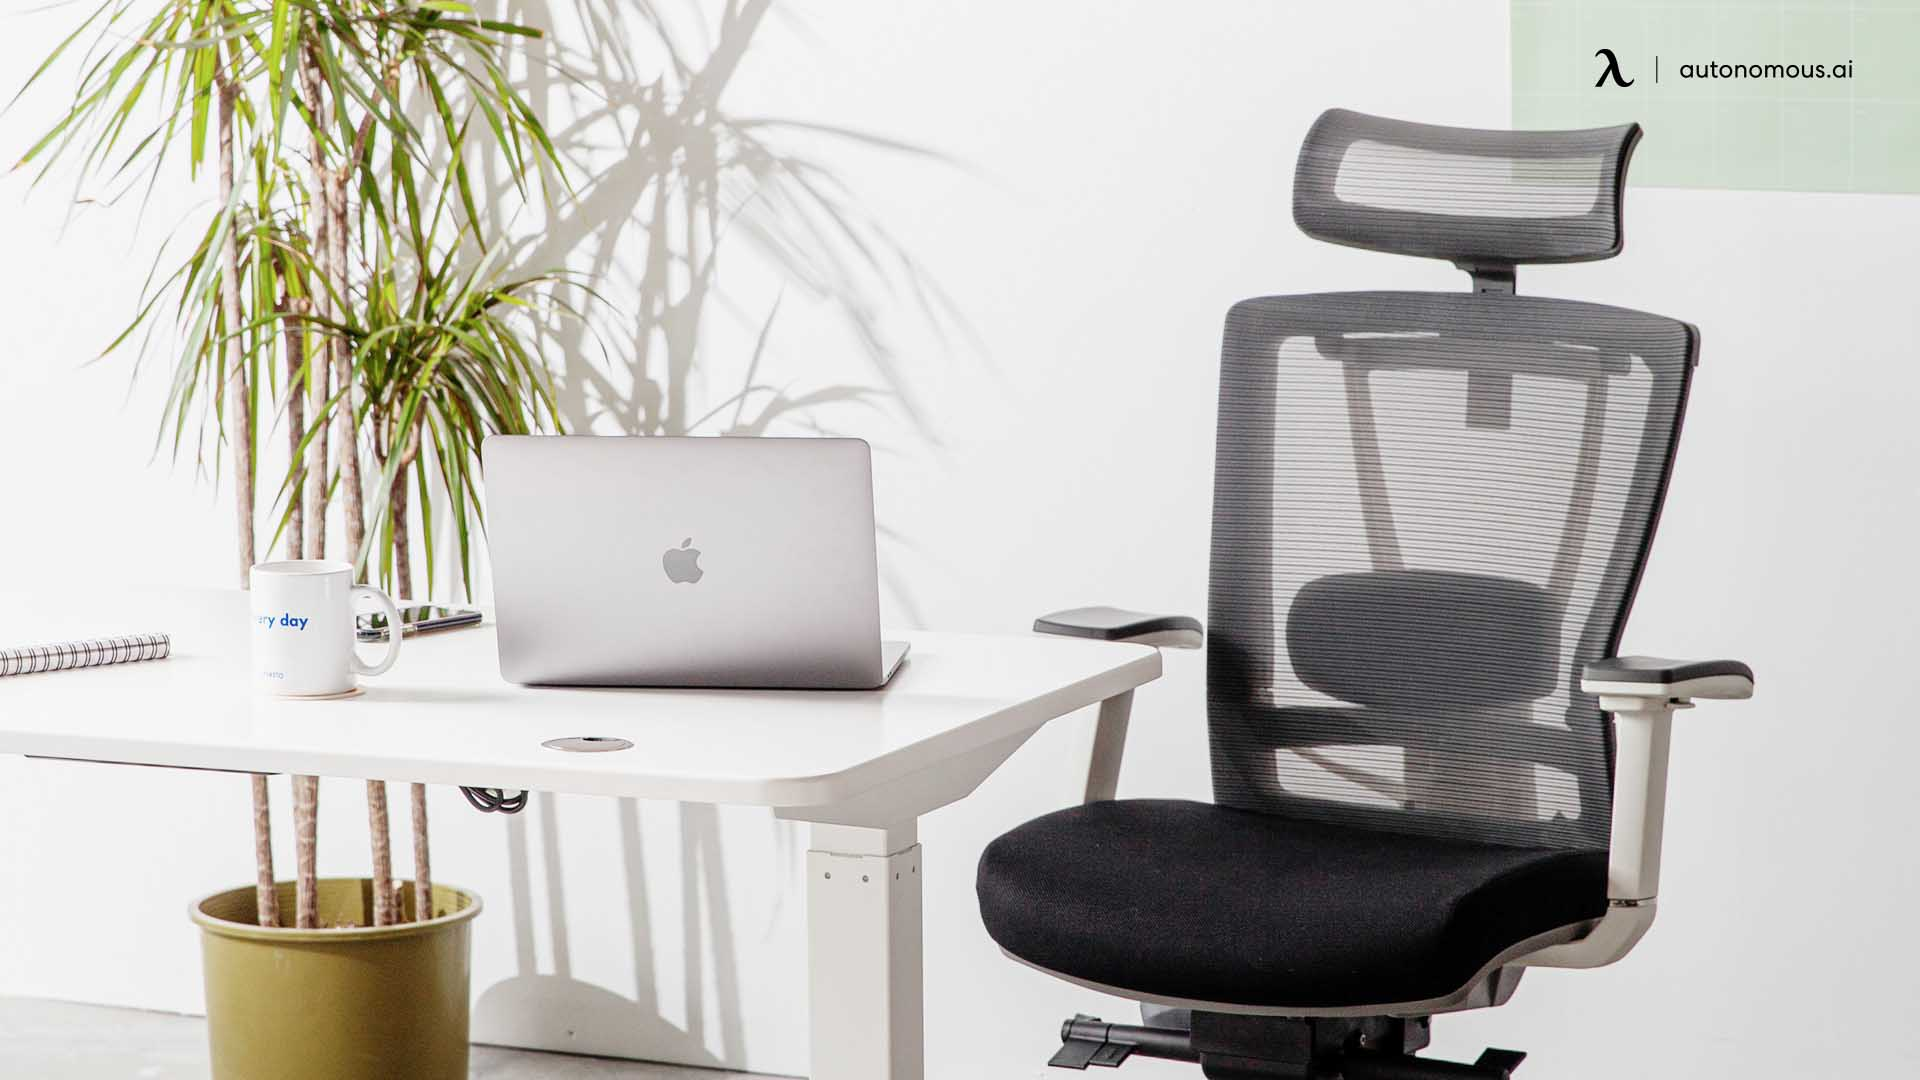 Ergonomic Desk and Chair